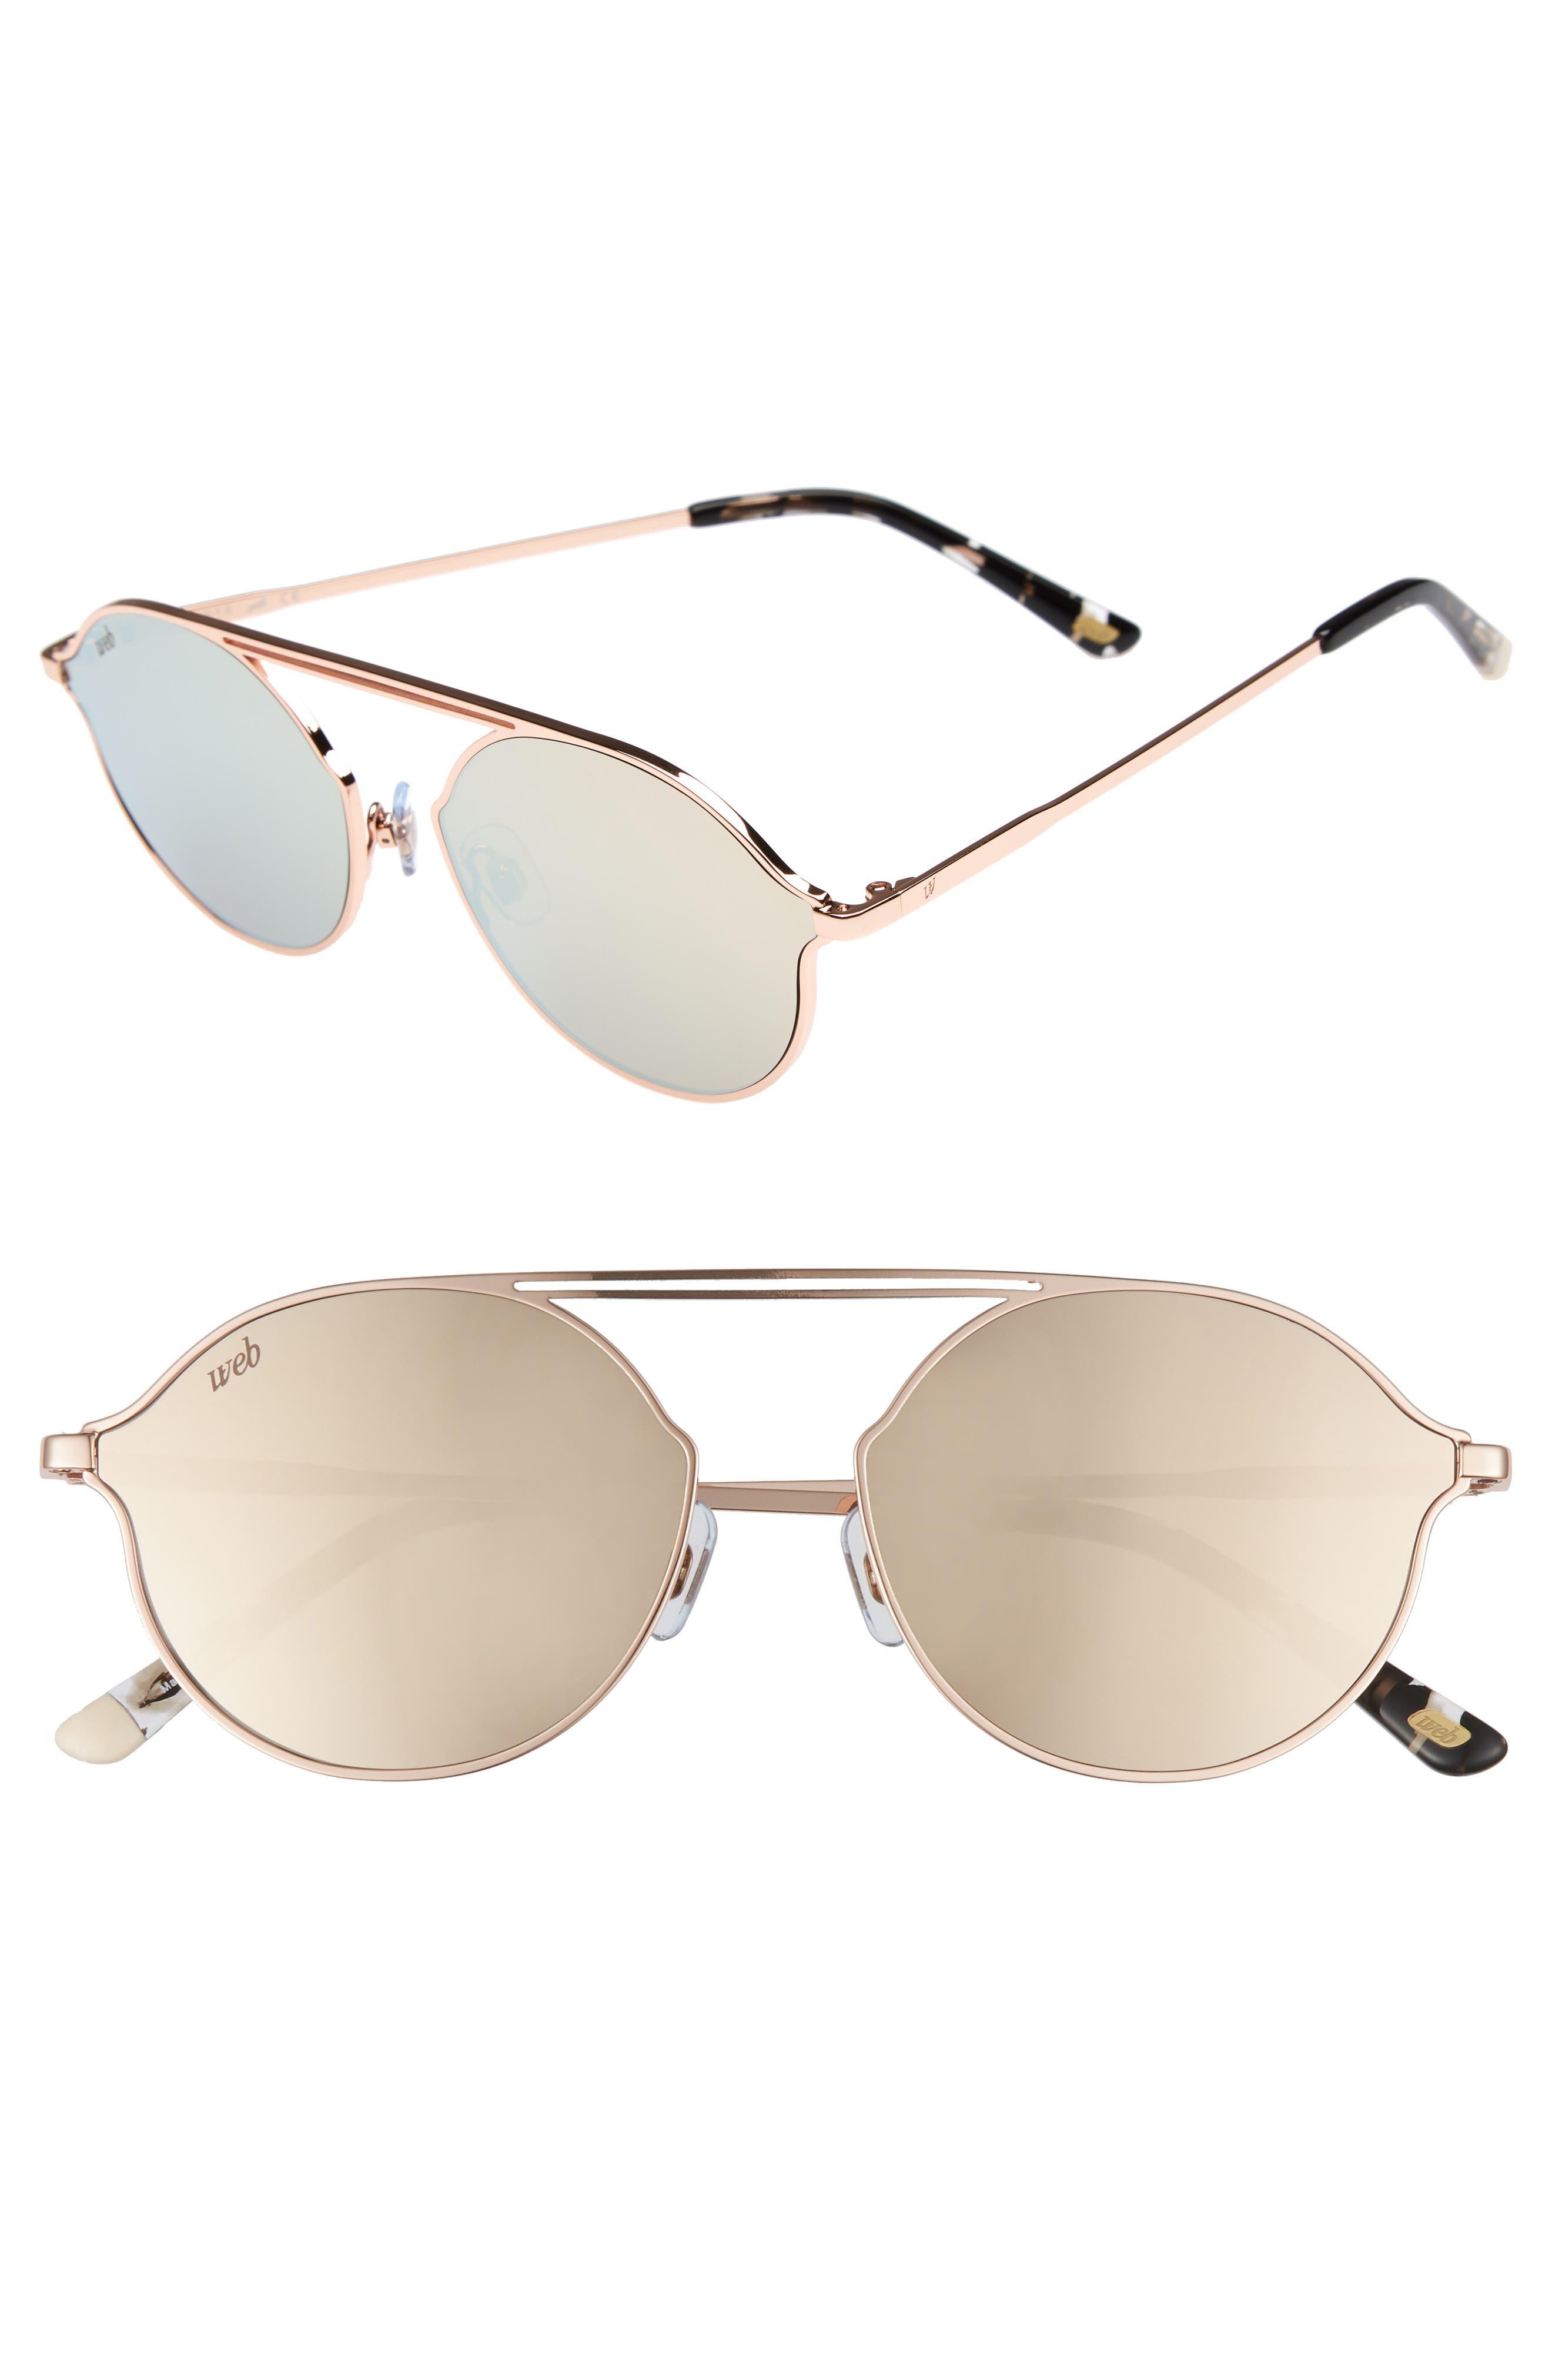 57mm Round Sunglasses,                             Main thumbnail 1, color,                             Light Bronze/ Brown Mirror